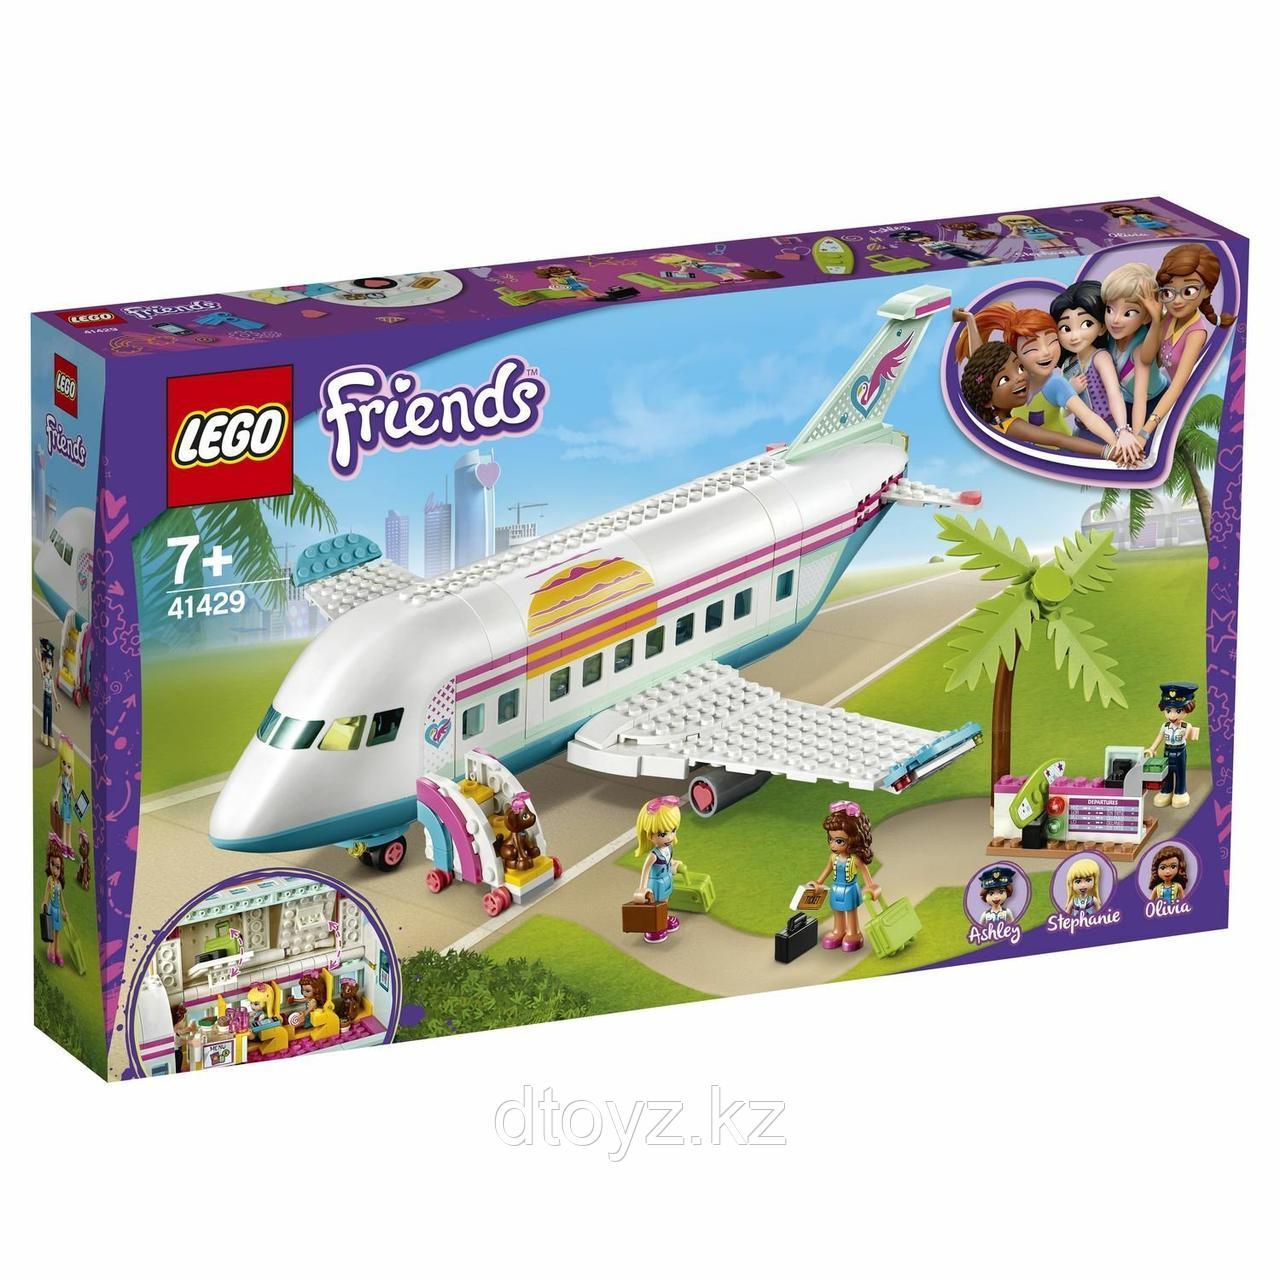 Lego Friends 41429 Самолёт в Хартлейк Сити